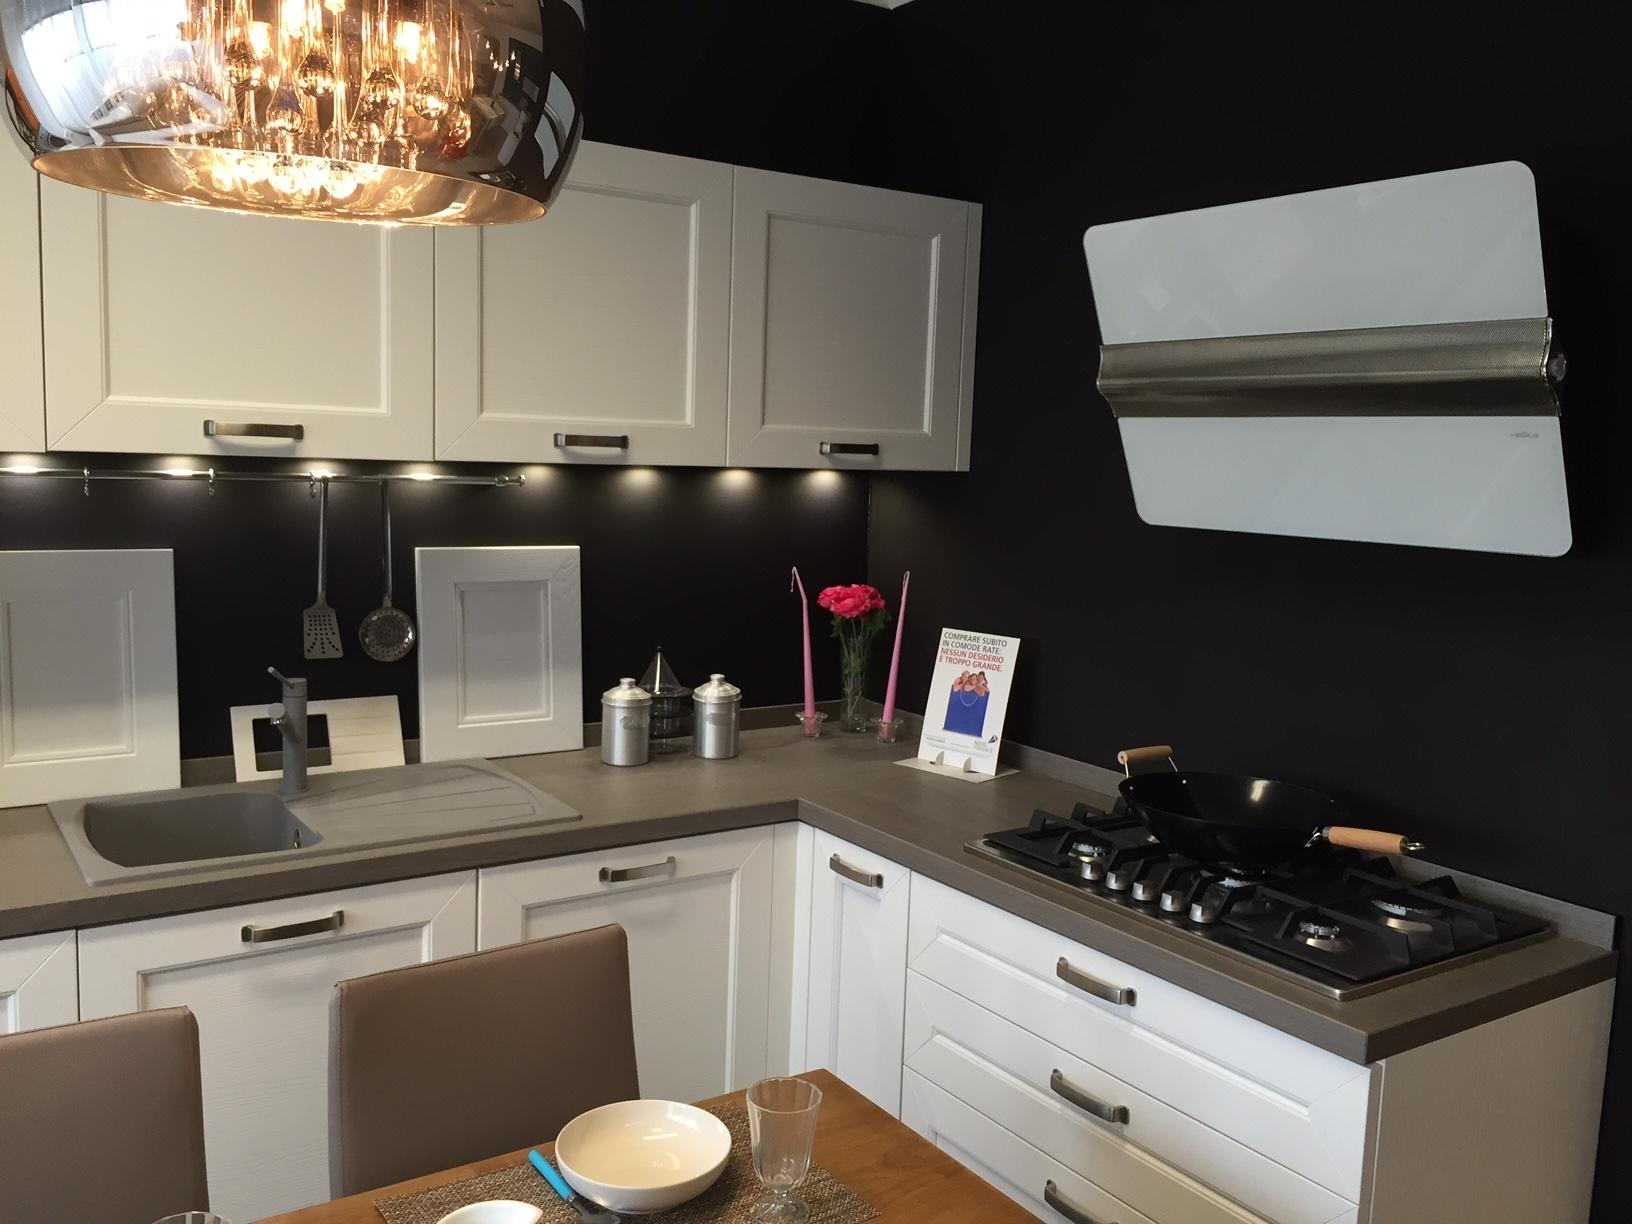 cucina effe4 creta moderna legno bianca - cucine a prezzi scontati - Gres Porcellanato Cucina Moderna